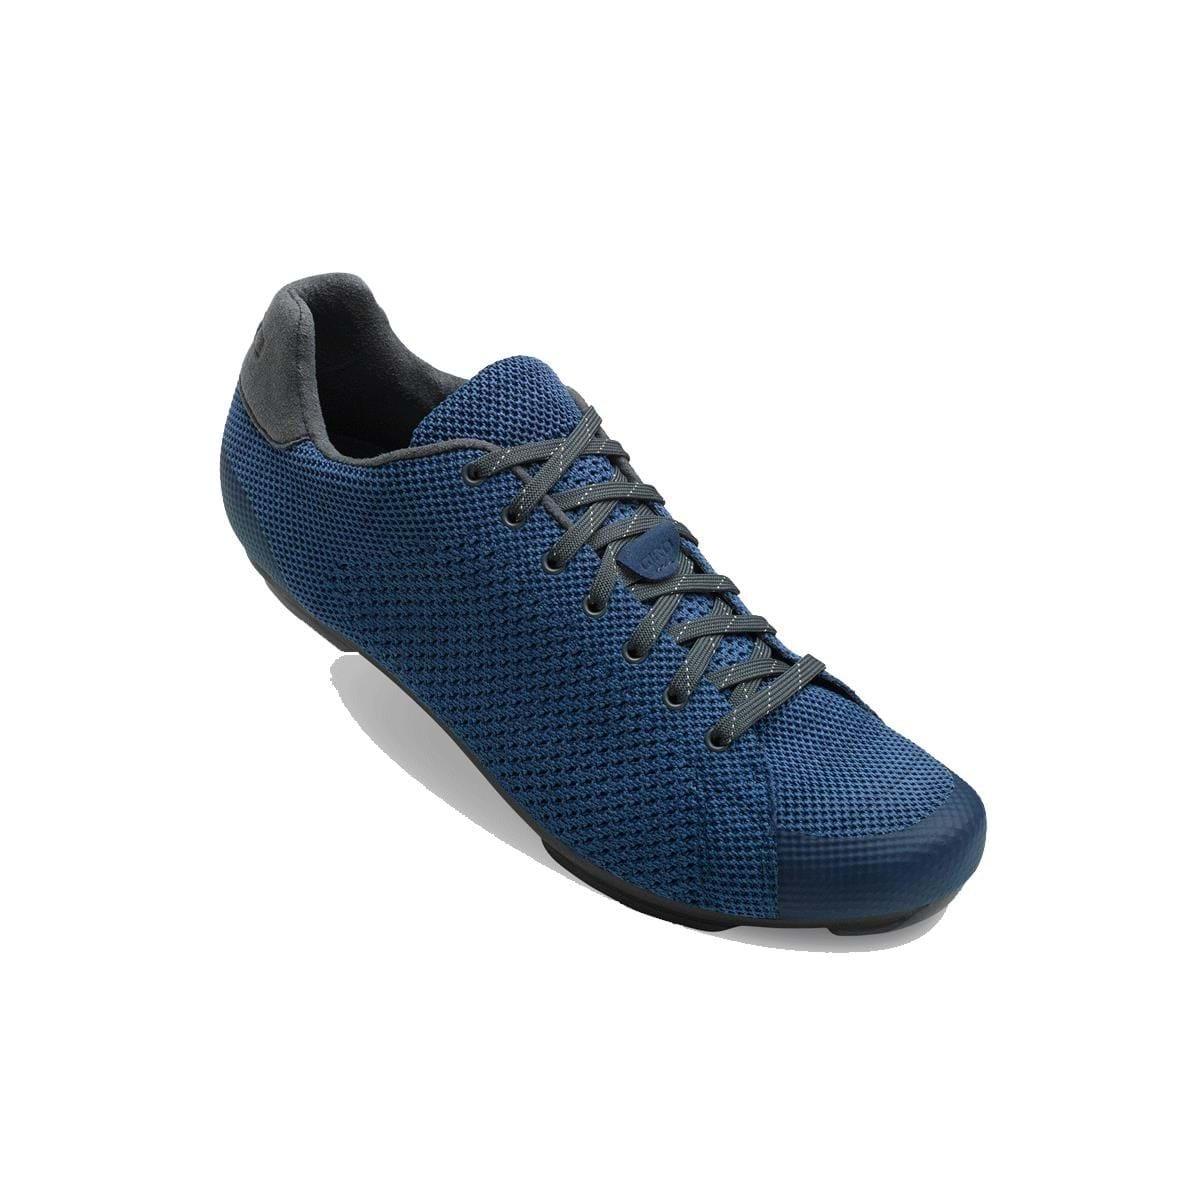 Republic R Knit Road Cycling Shoes